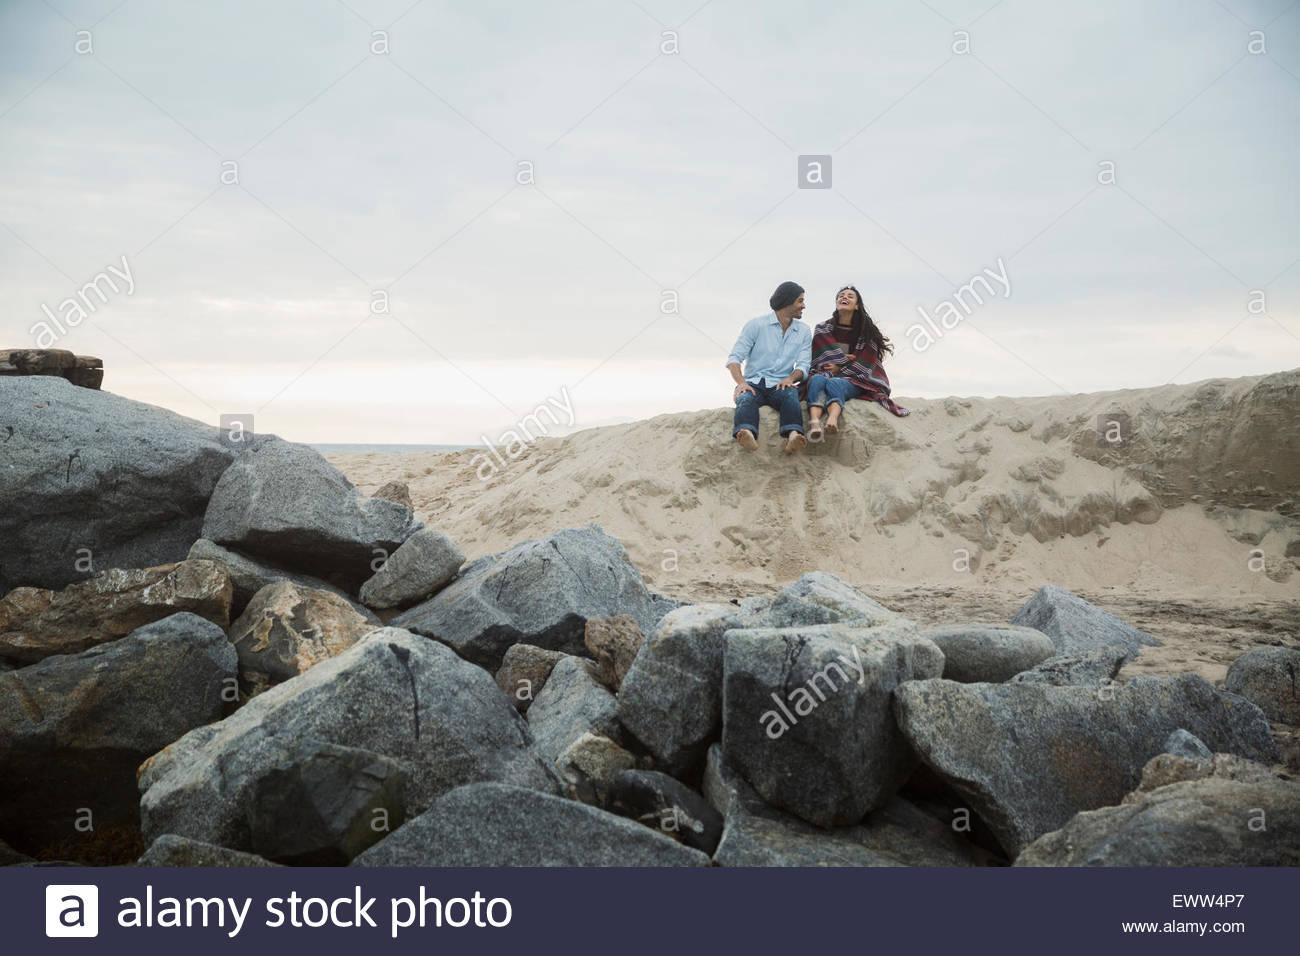 Couple sitting sand hill at beach near rocks - Stock Image